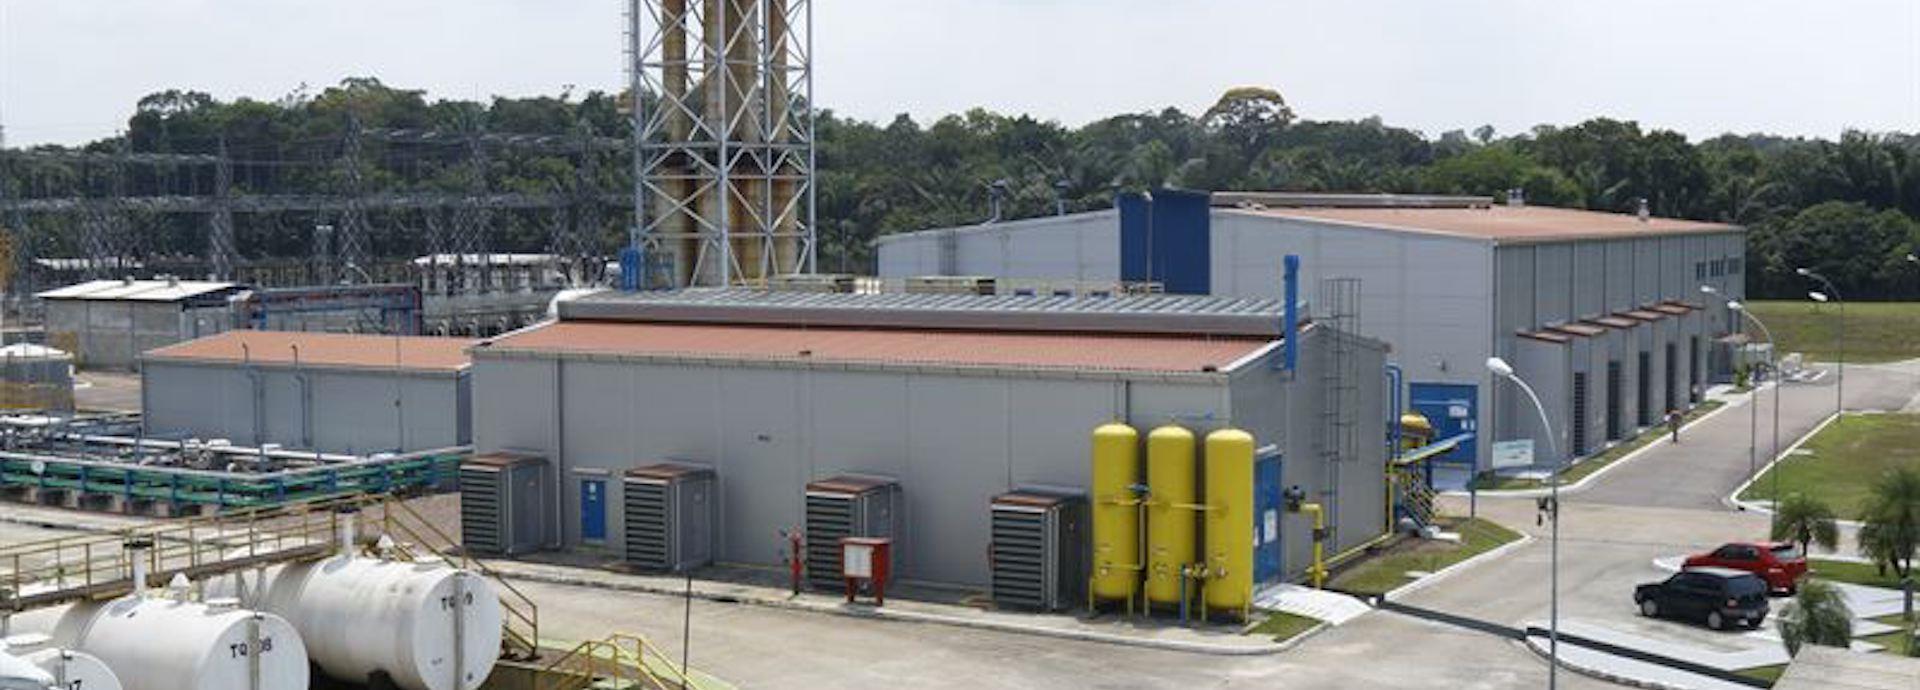 Cristiano Rocha power plant